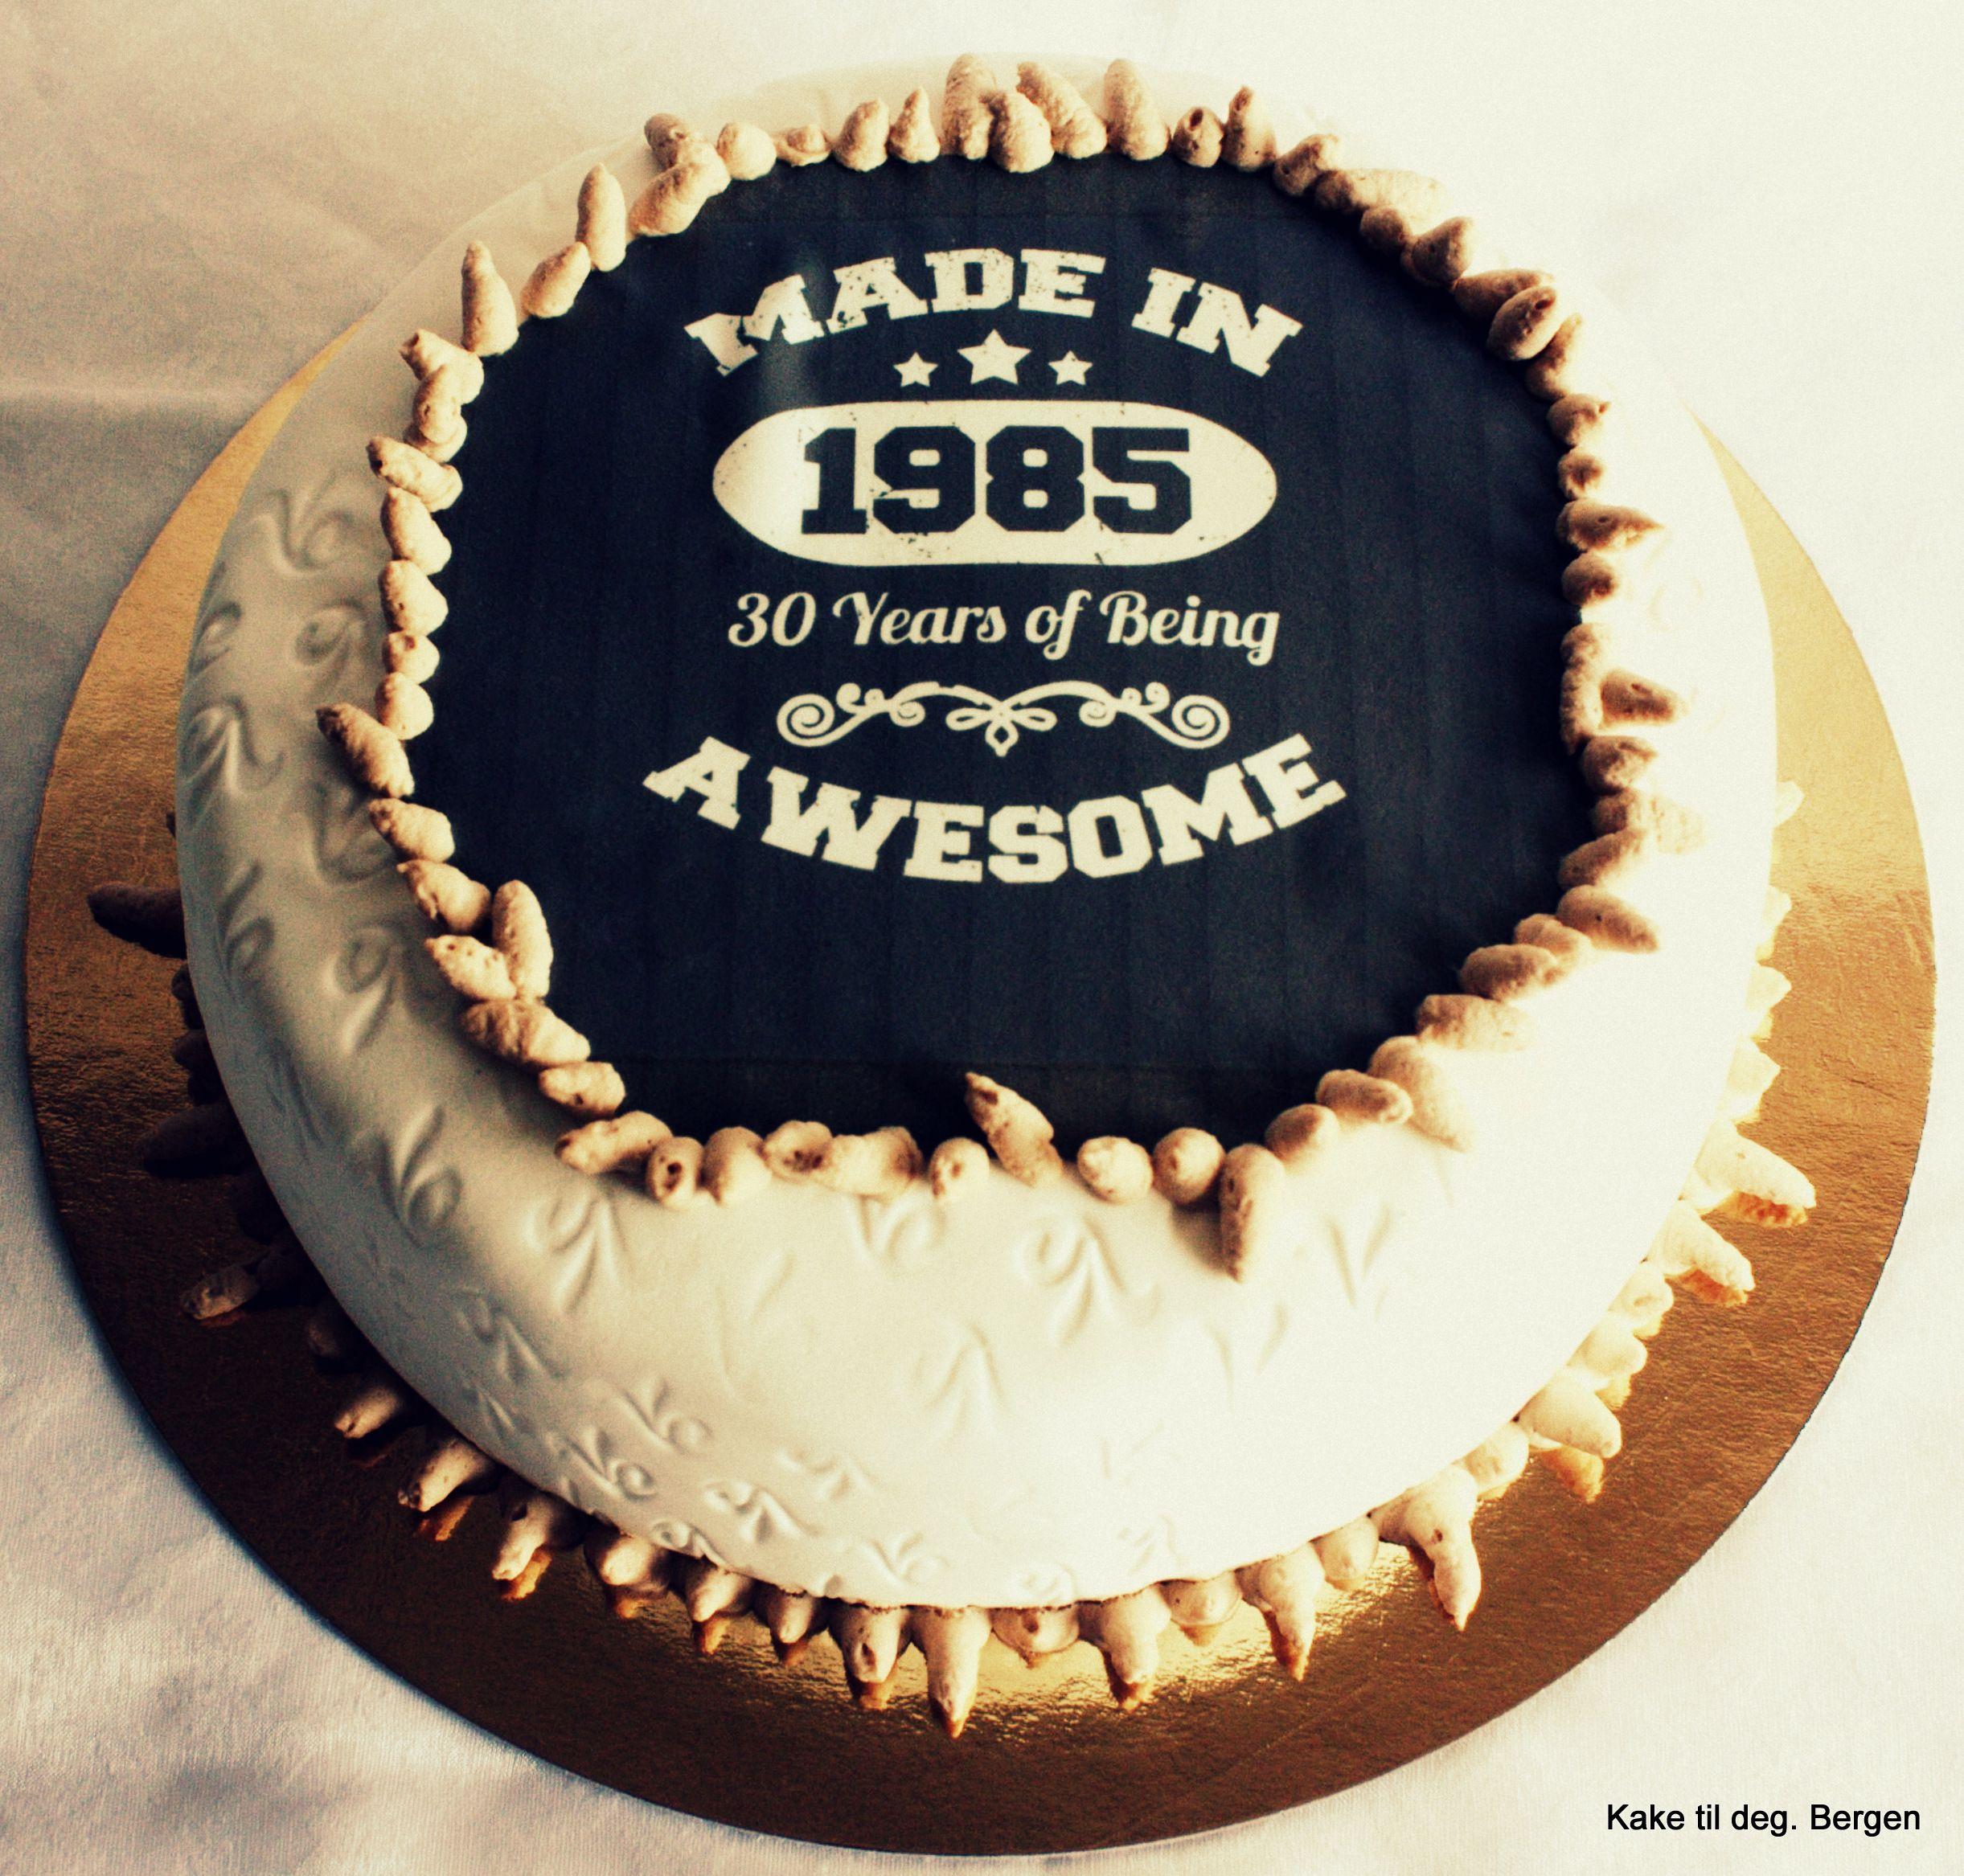 Phenomenal Birthday Cake Design For Him The Cake Boutique Funny Birthday Cards Online Elaedamsfinfo